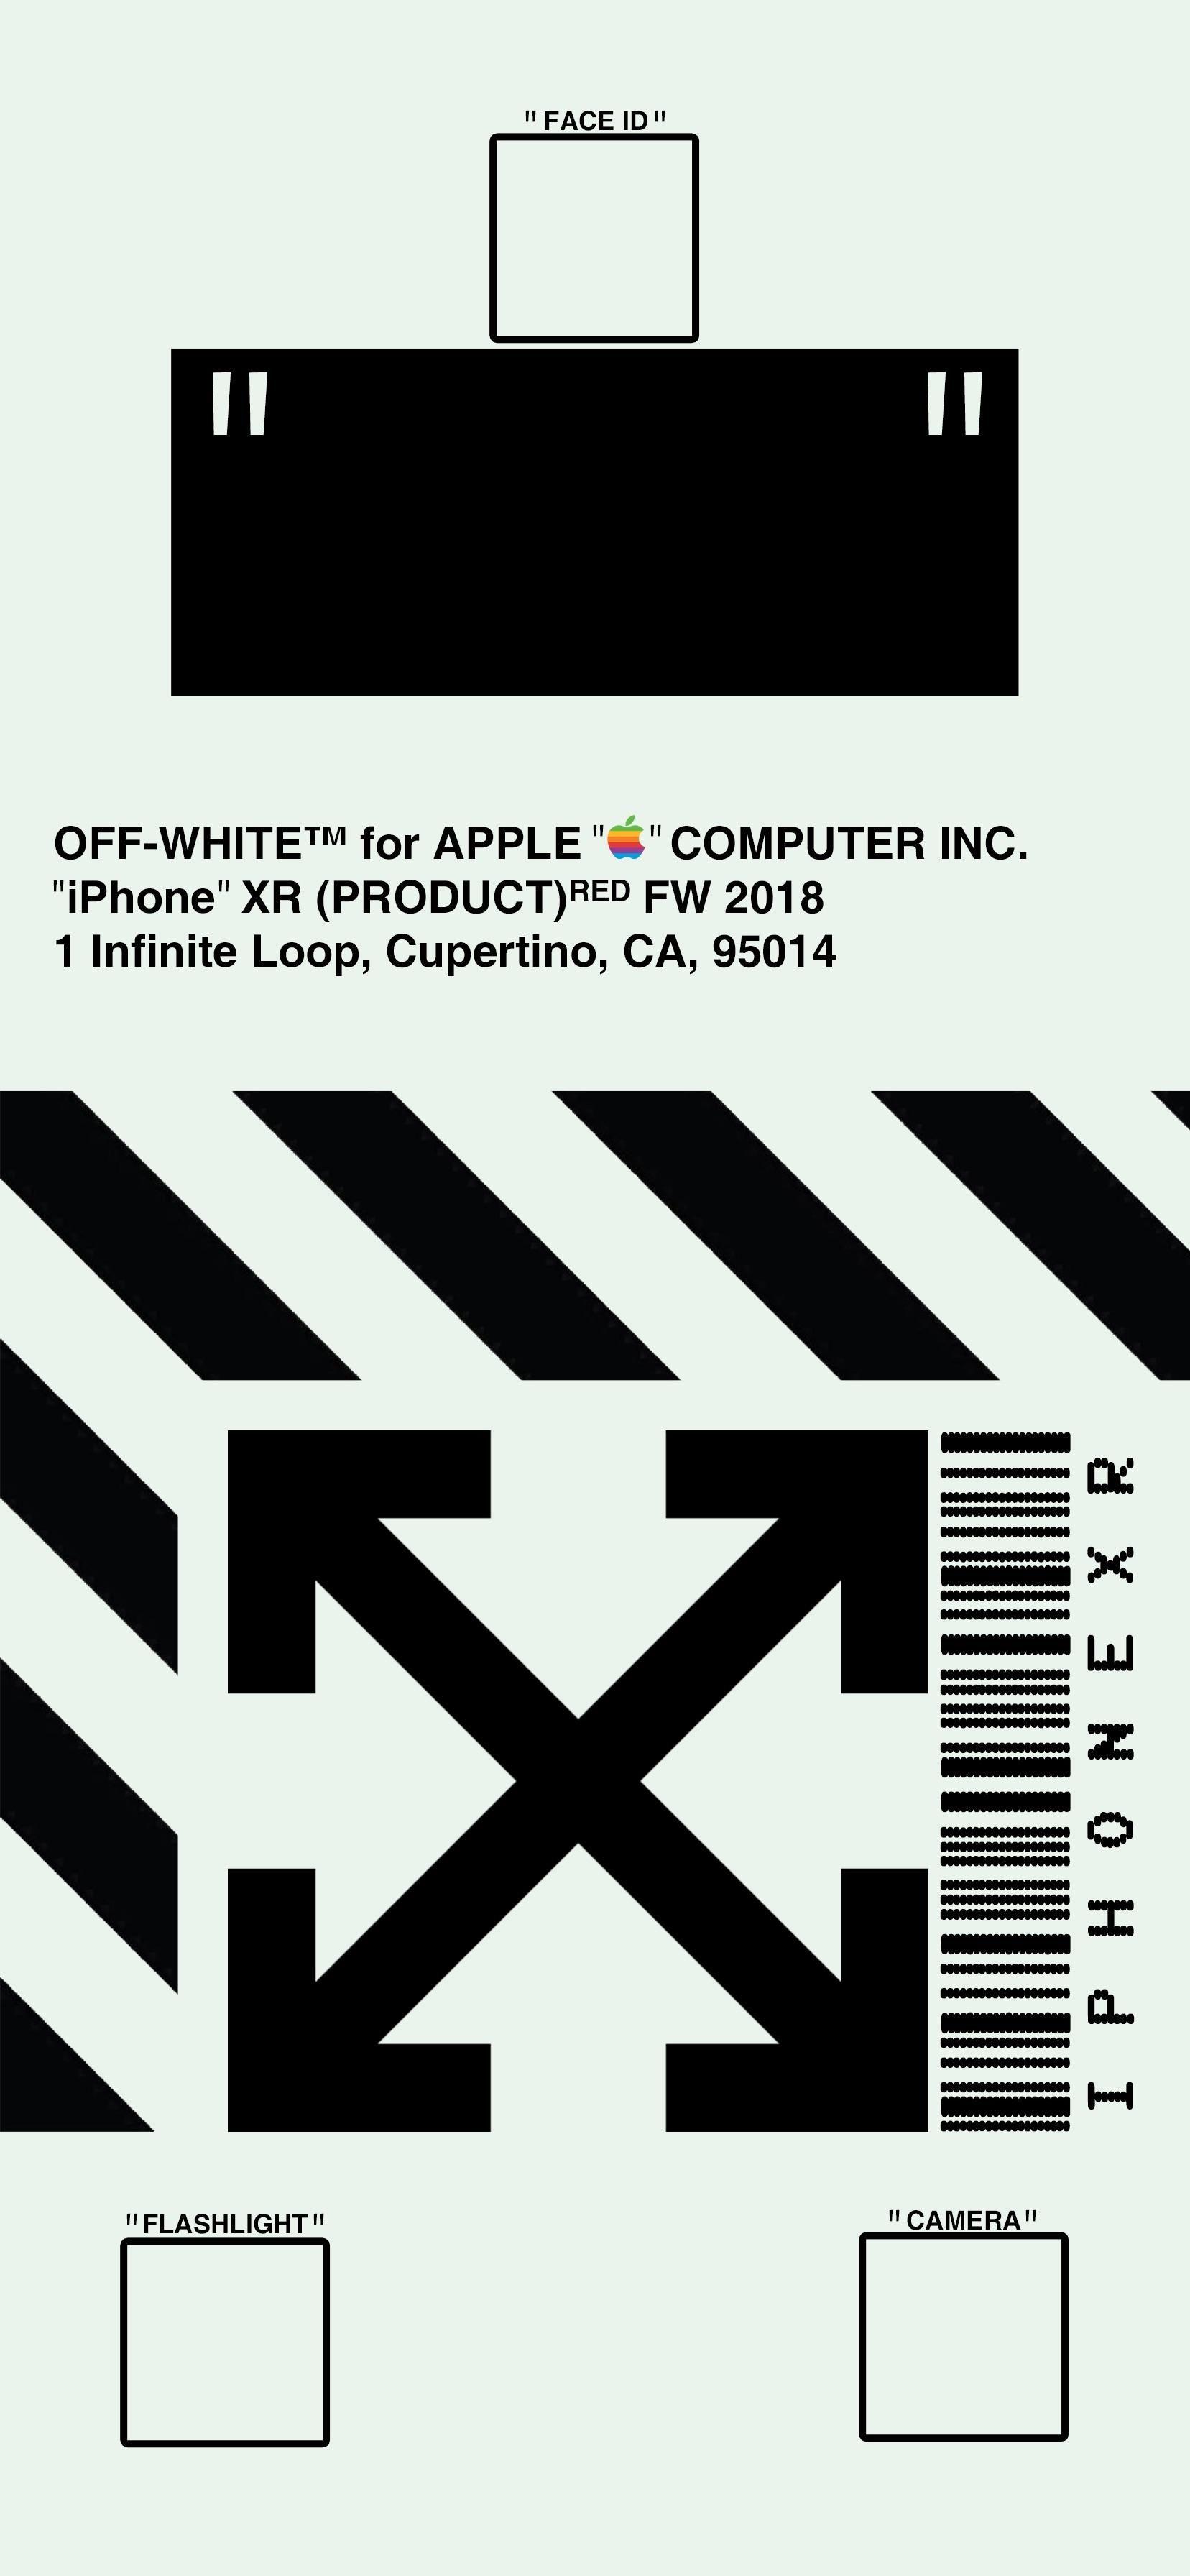 Wallpaper Iphone Off White In 2021 White Wallpaper For Iphone Iphone Wallpaper Off White Wallpaper Off White